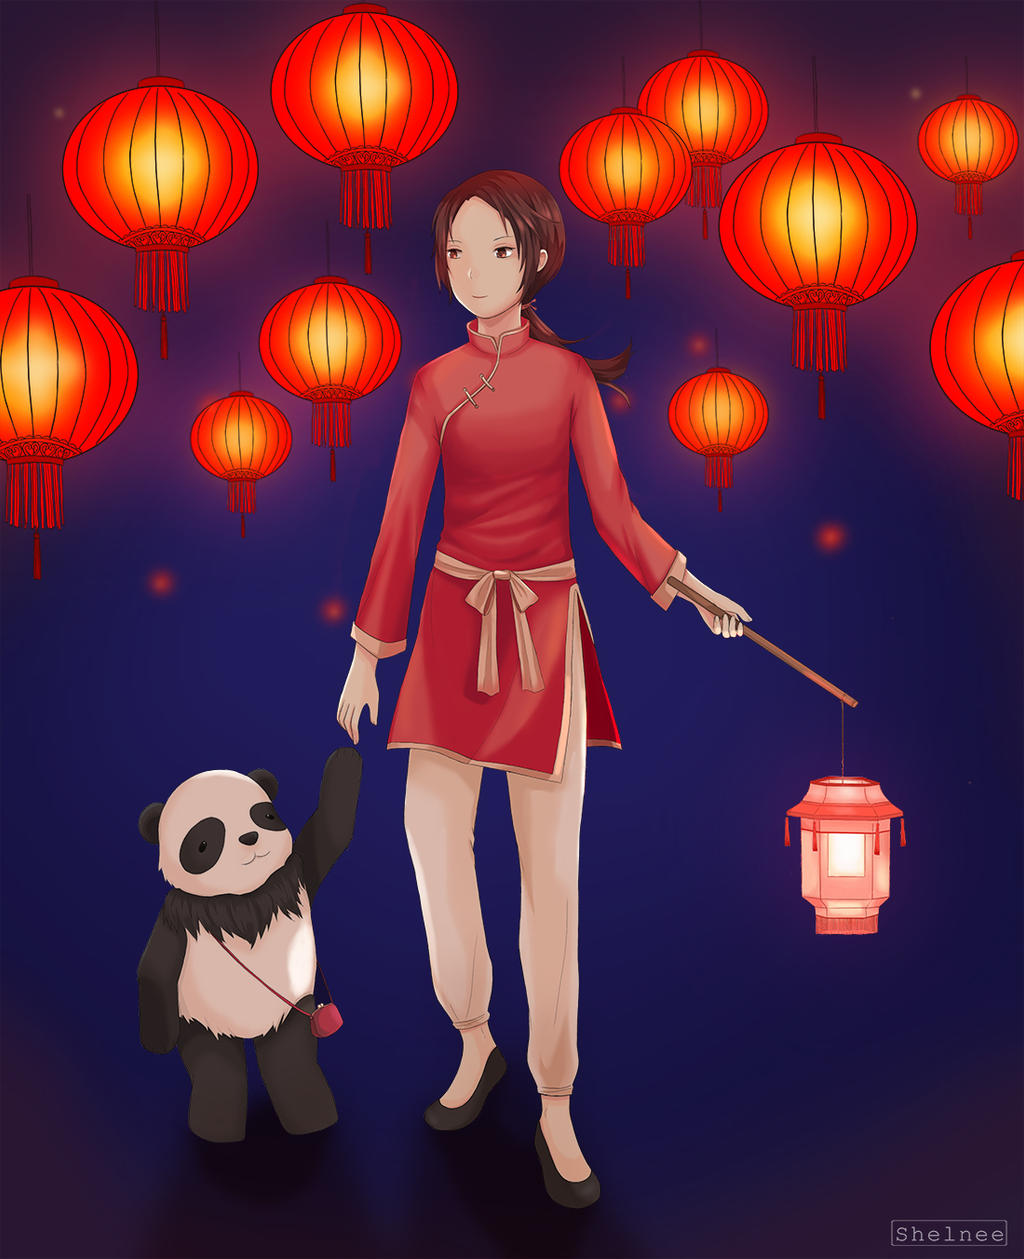 Chinese Lantern Festival (Hetalia Fanart) by ShelneeLynn